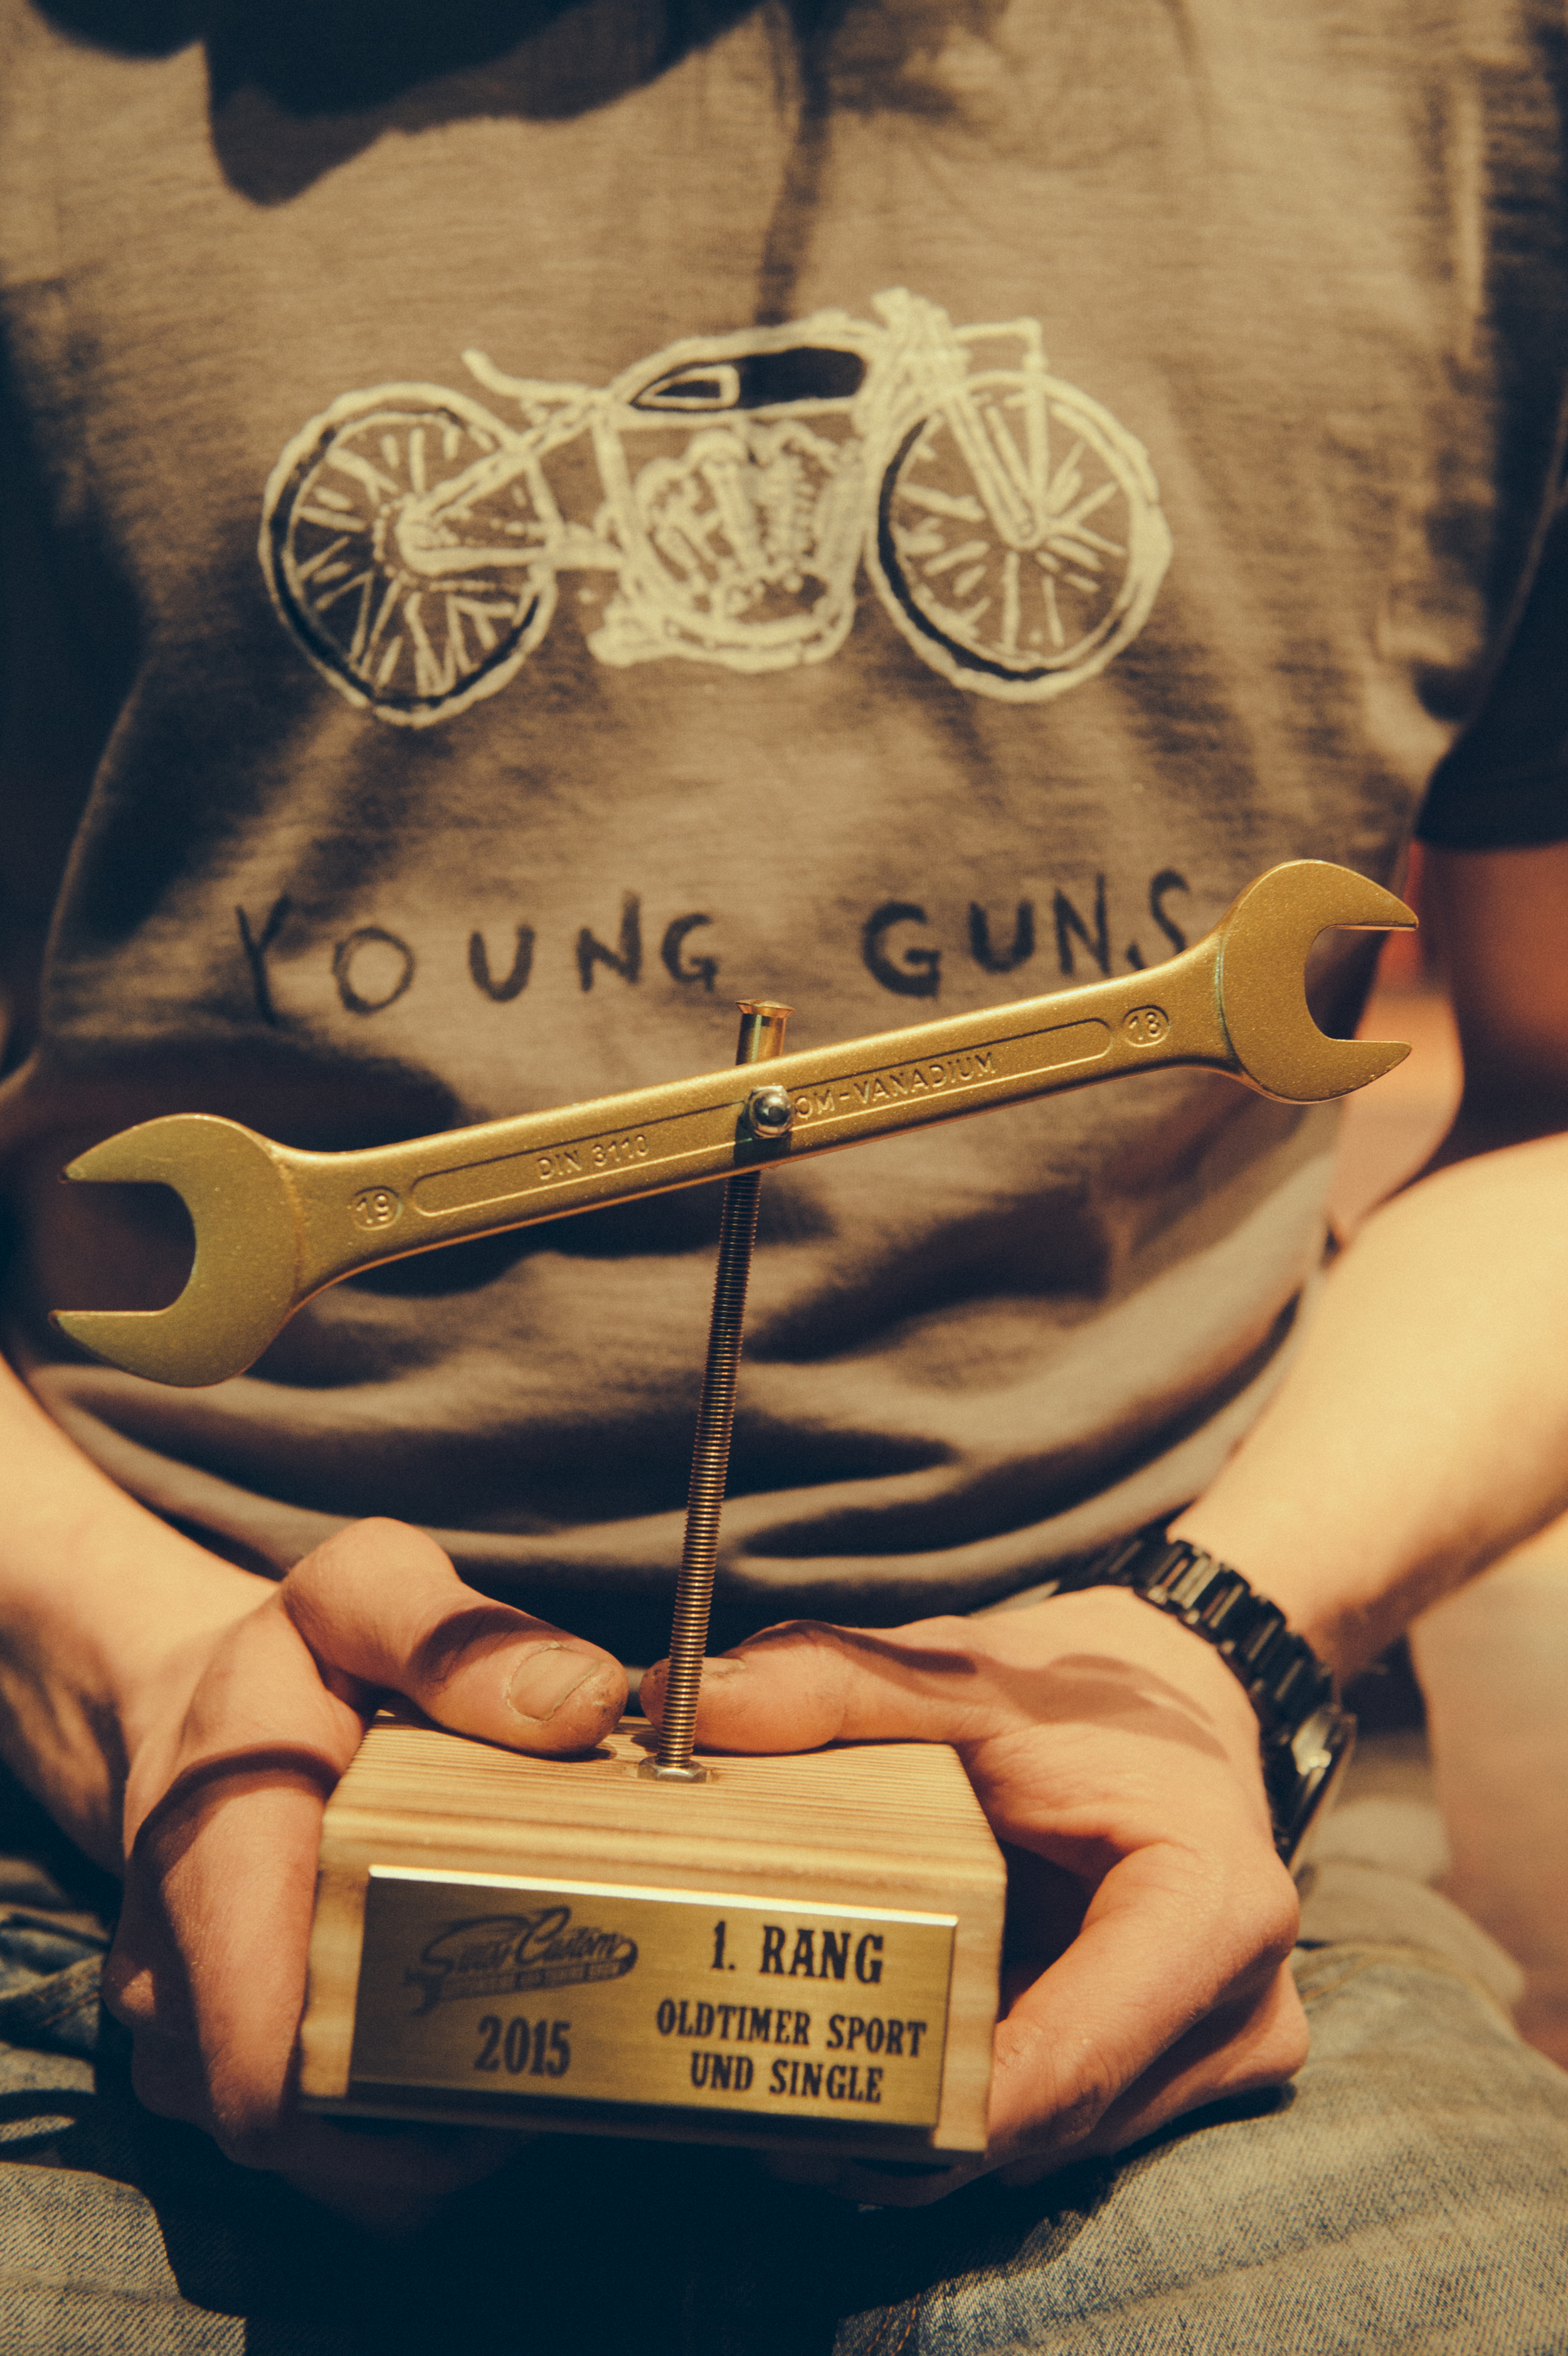 Young_Guns_Speedshop_Swissmoto2015_ByLorenzrichard.com-6411.jpg